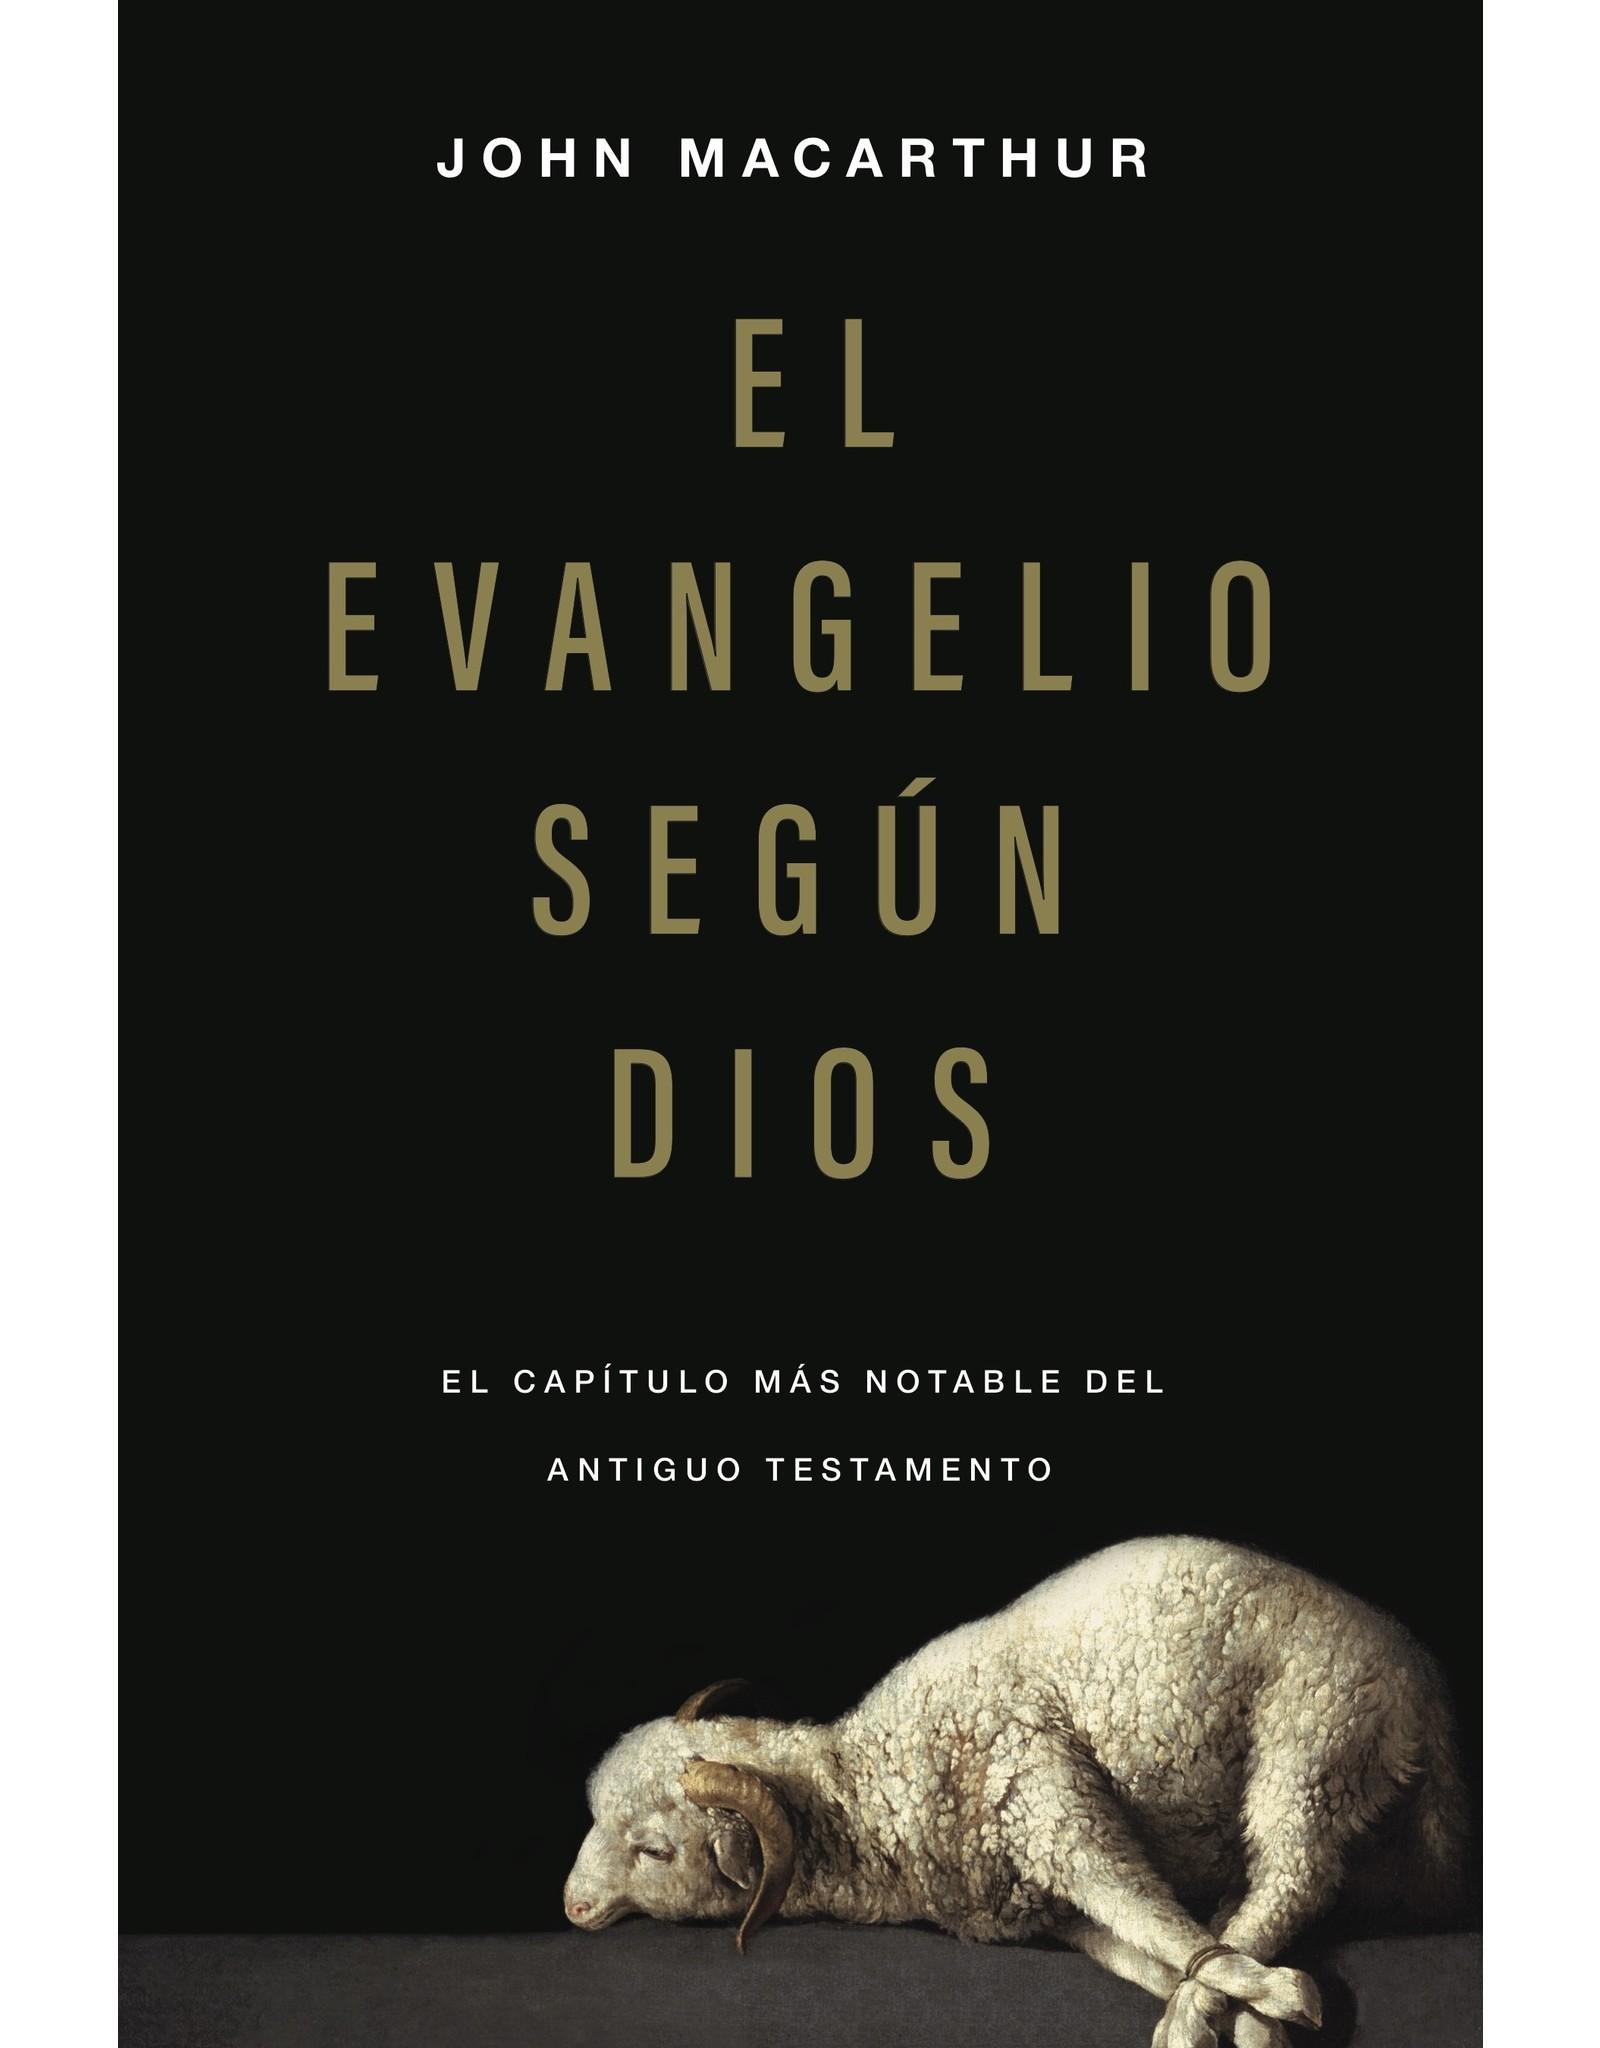 Kregel / Portavoz / Ingram Spanish-The Gospel According to God (El Evangelio según Dios)